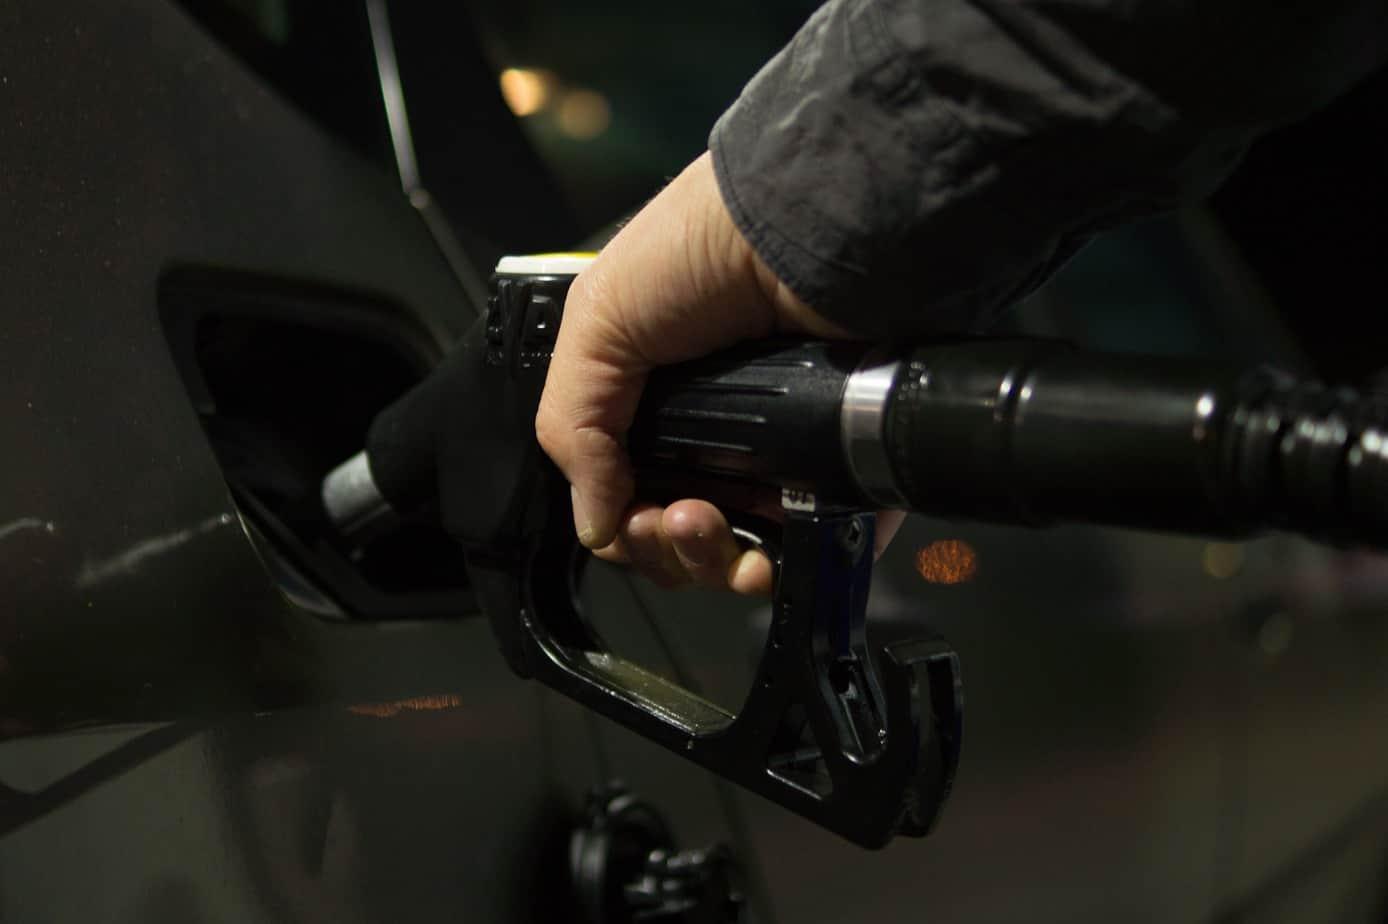 Alza del dolar tras estallido Social dispara las bencinas por cuarta semana consecutiva